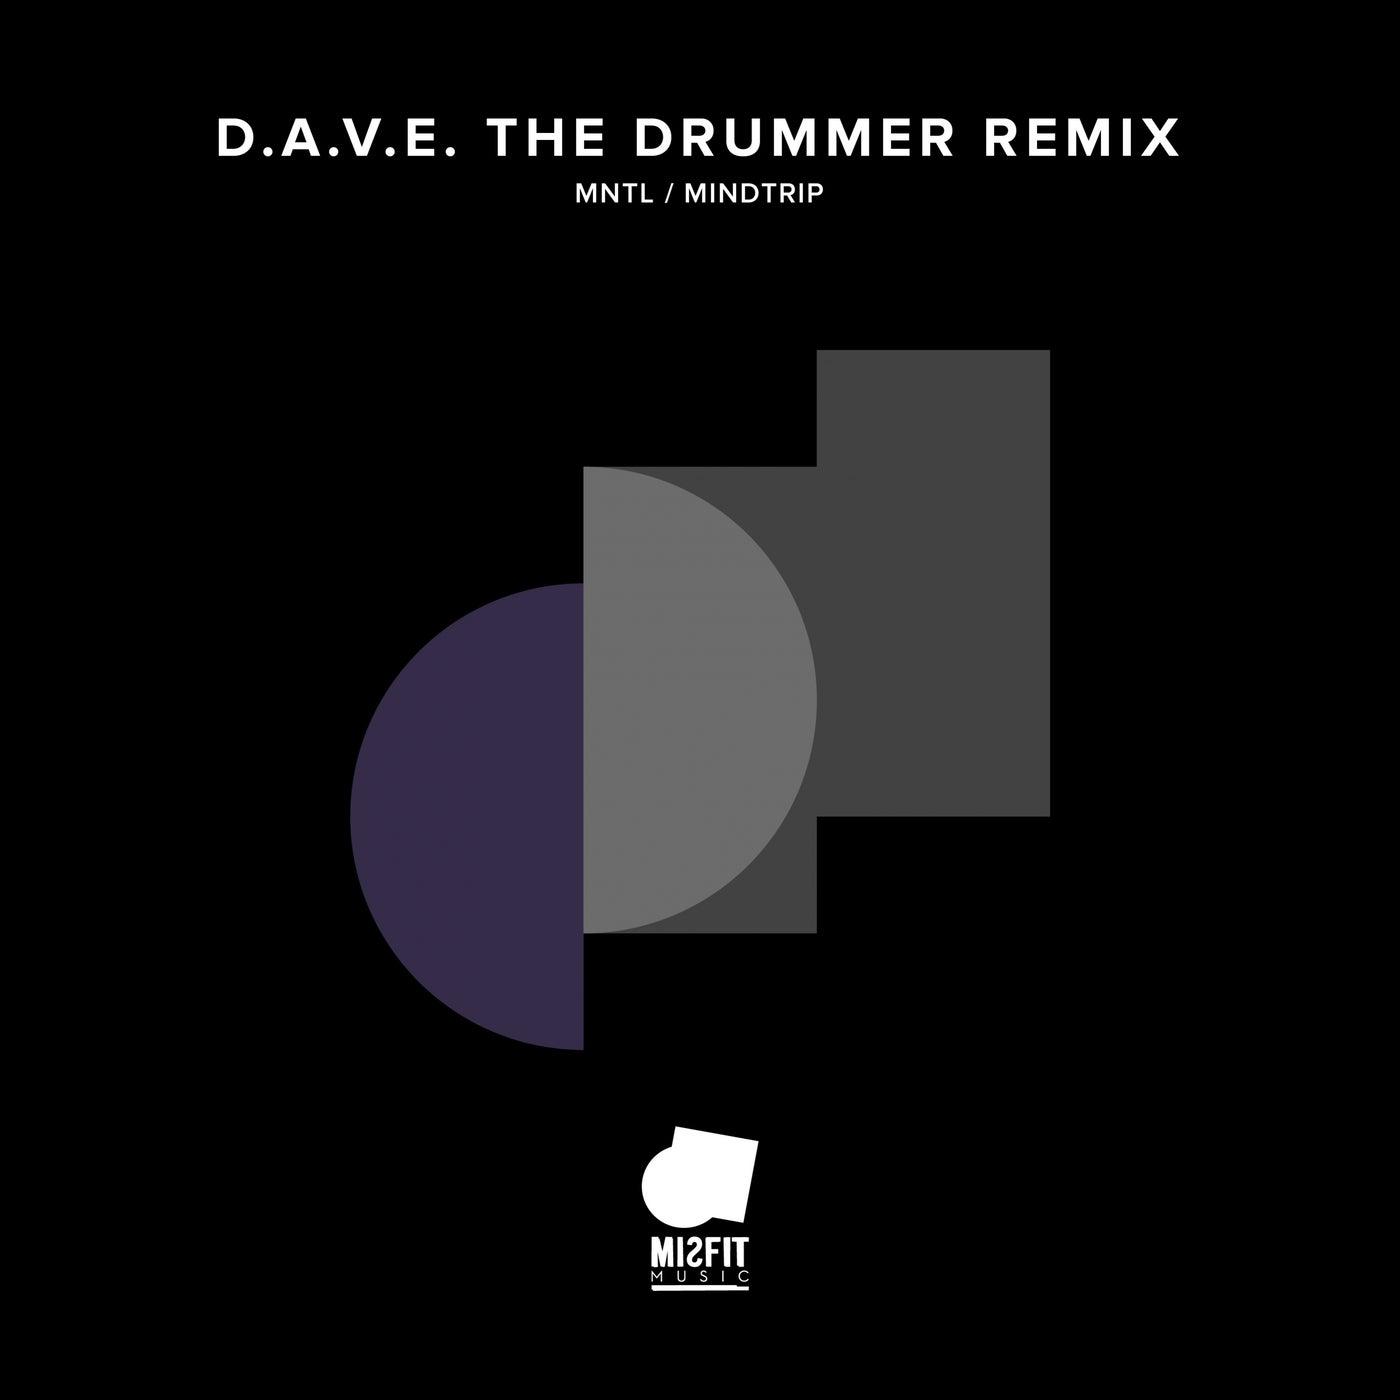 Mindtrip (D.A.V.E. The Drummer Remix)